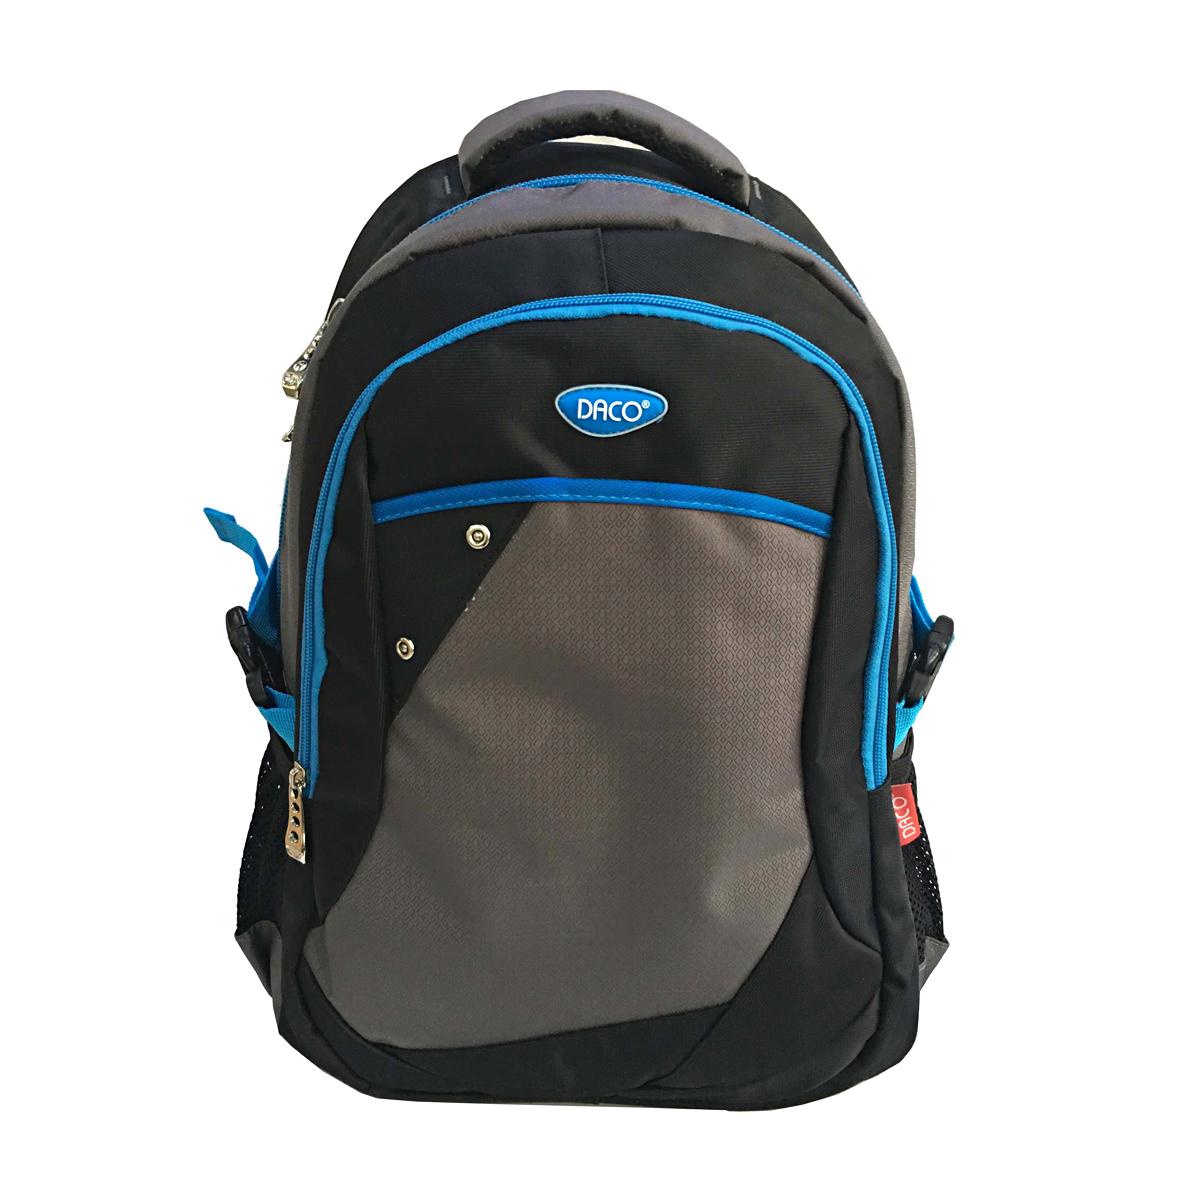 Ghiozdan Pentru Adolescenţi, 46 Centimetri, Albastru & Gri, Daco, GH506